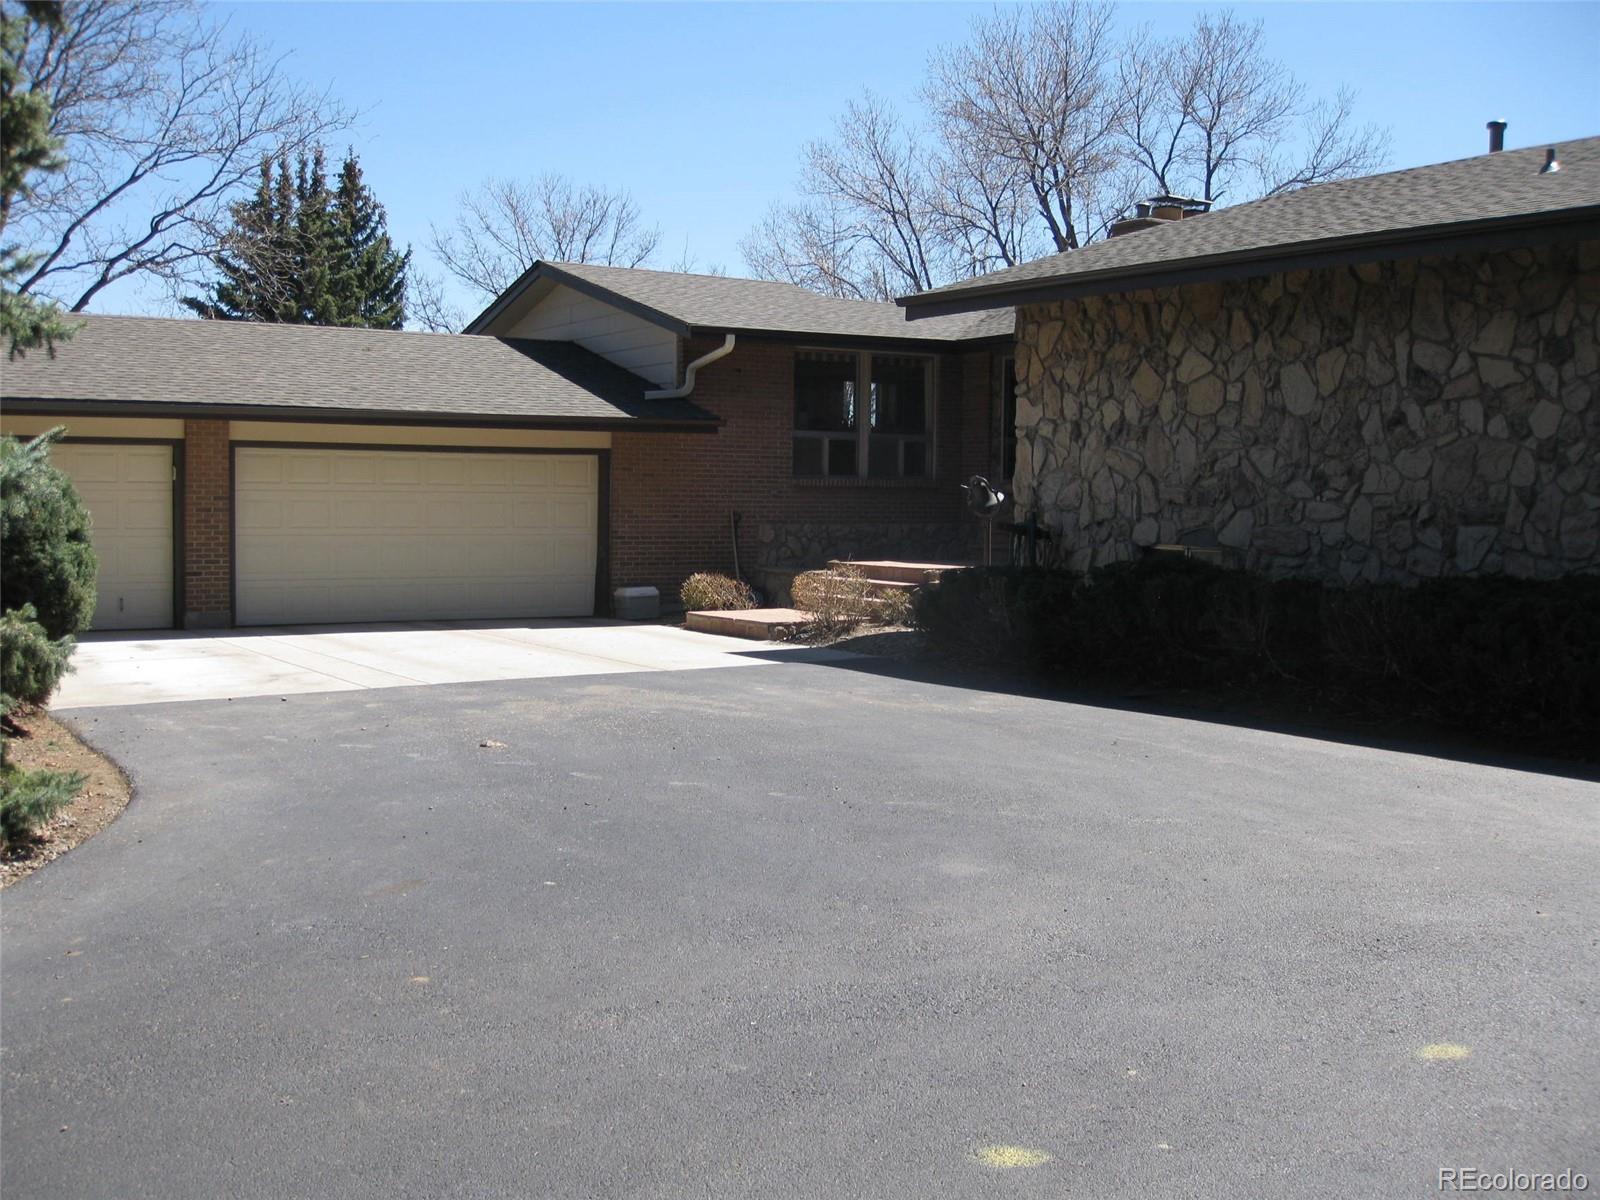 15812 W 64th Avenue Property Photo - Arvada, CO real estate listing